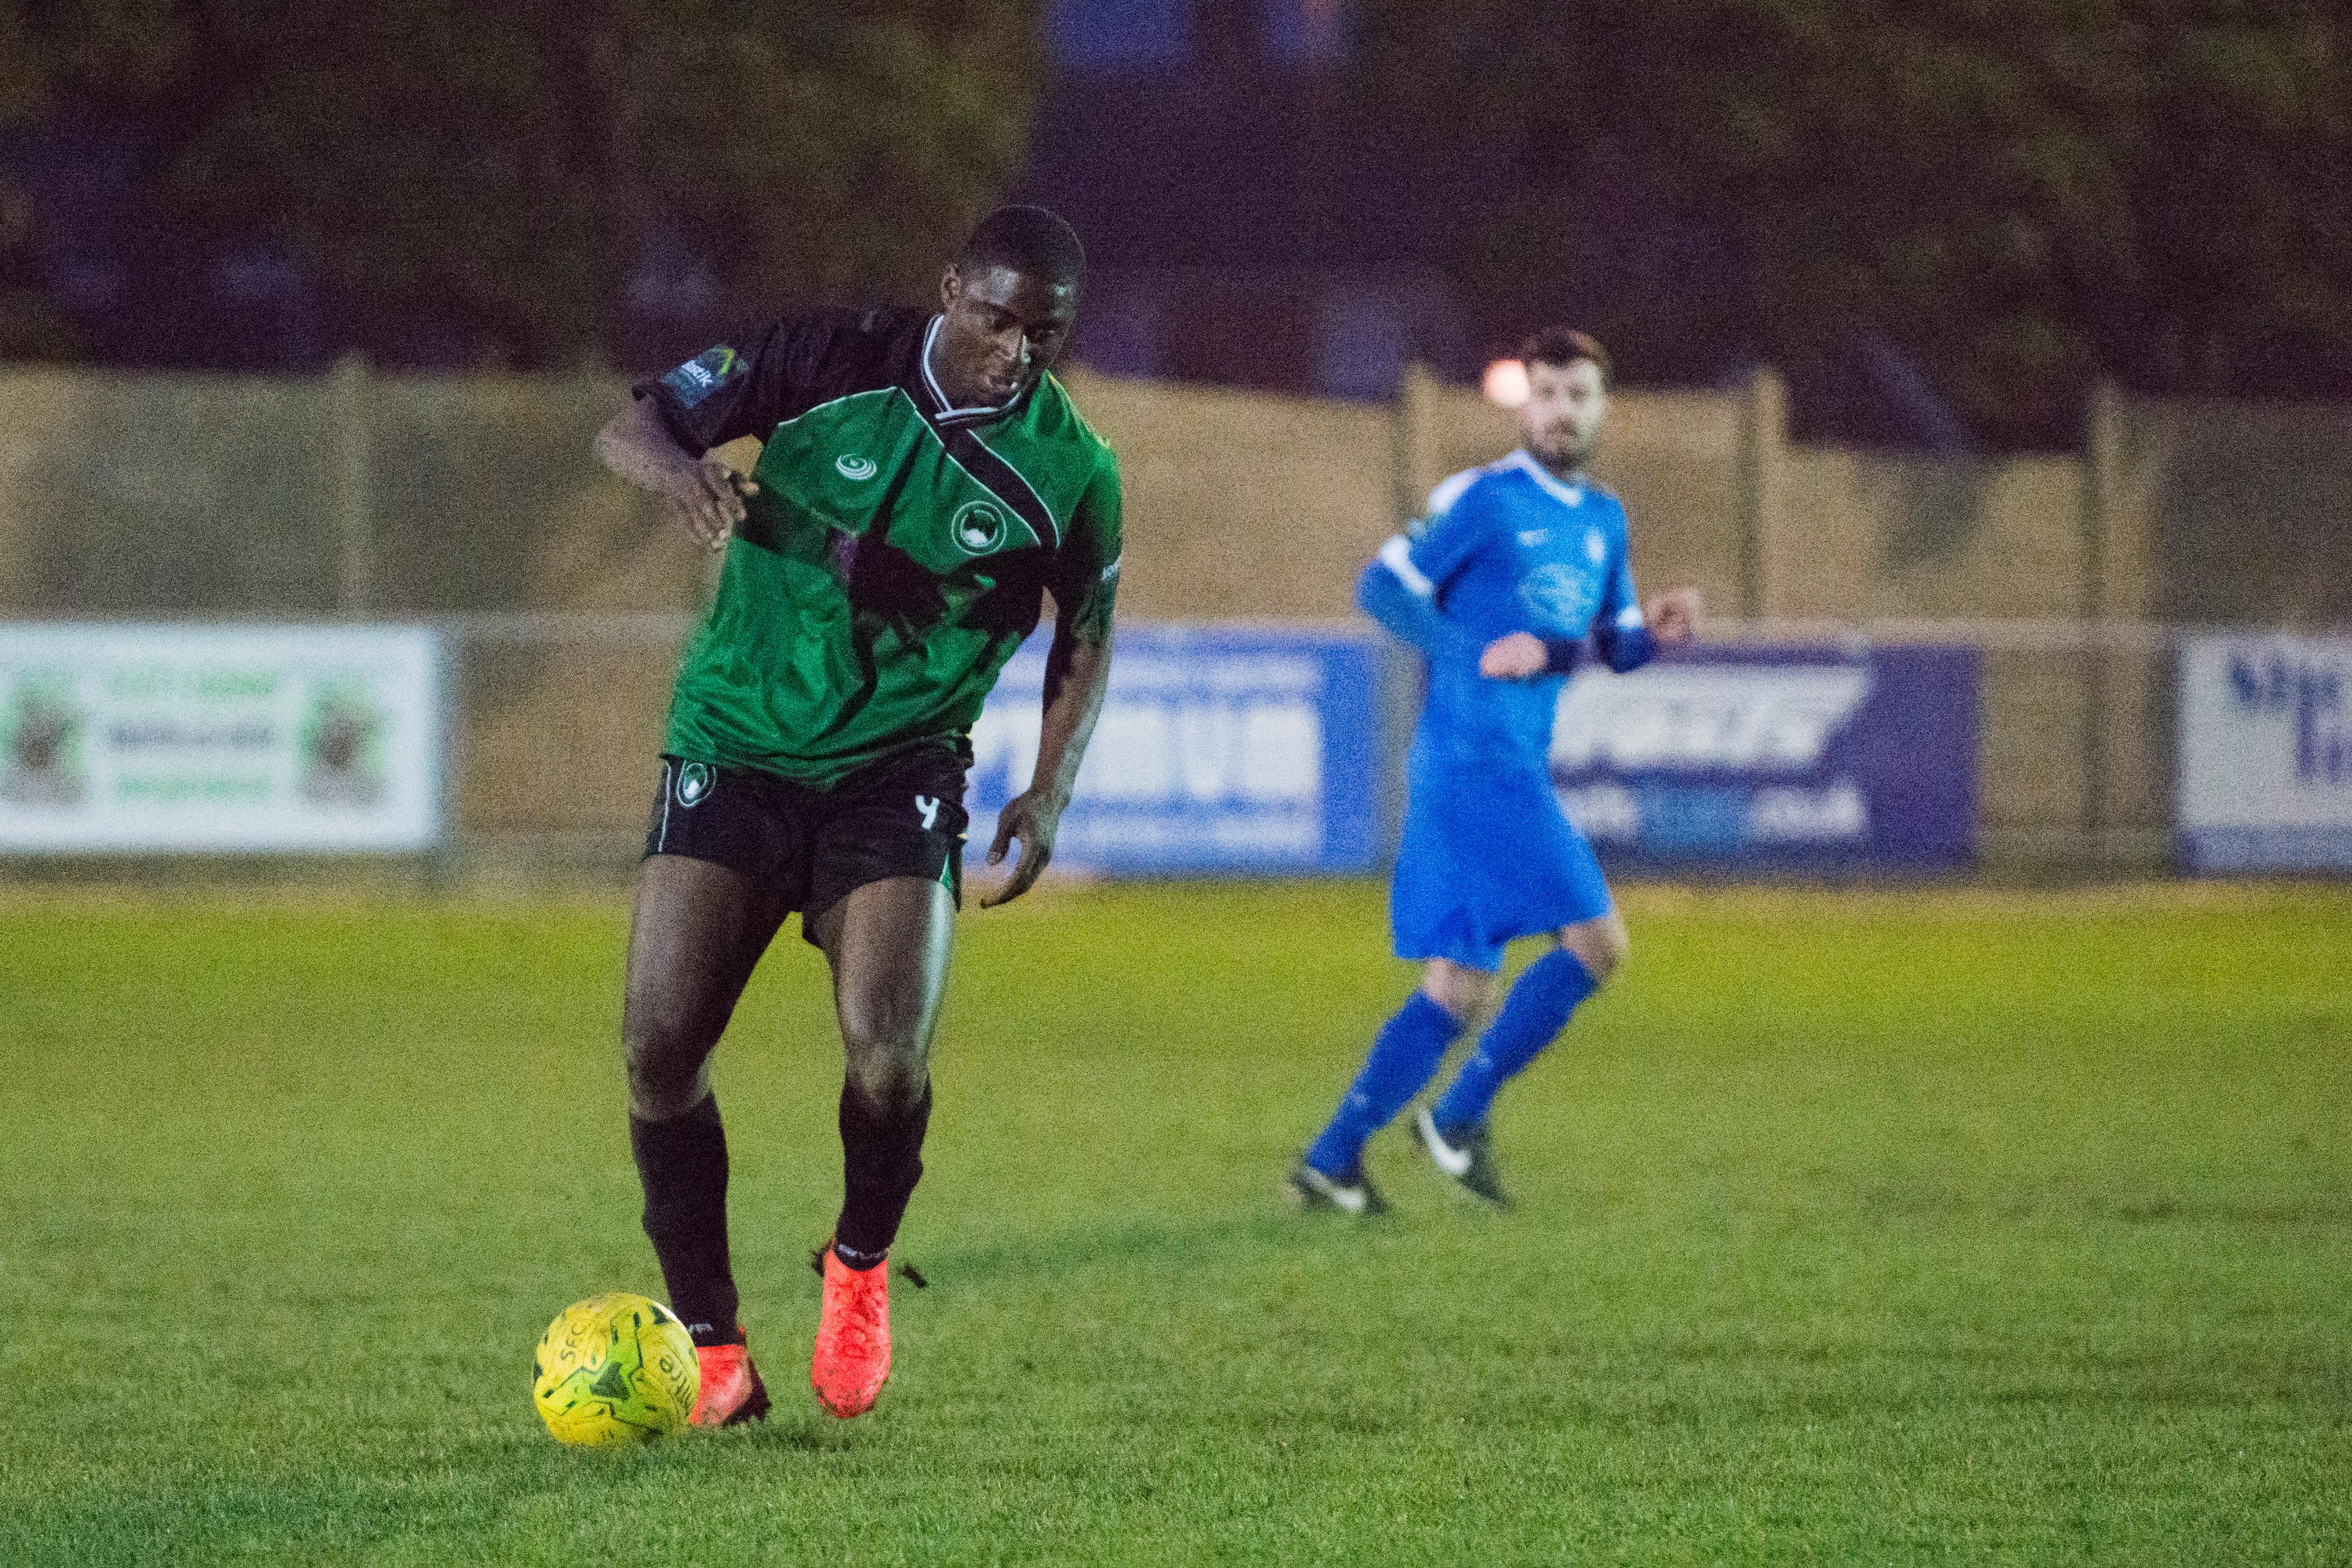 Shoreham FC vs Phoenix Sports 13.01.18 51